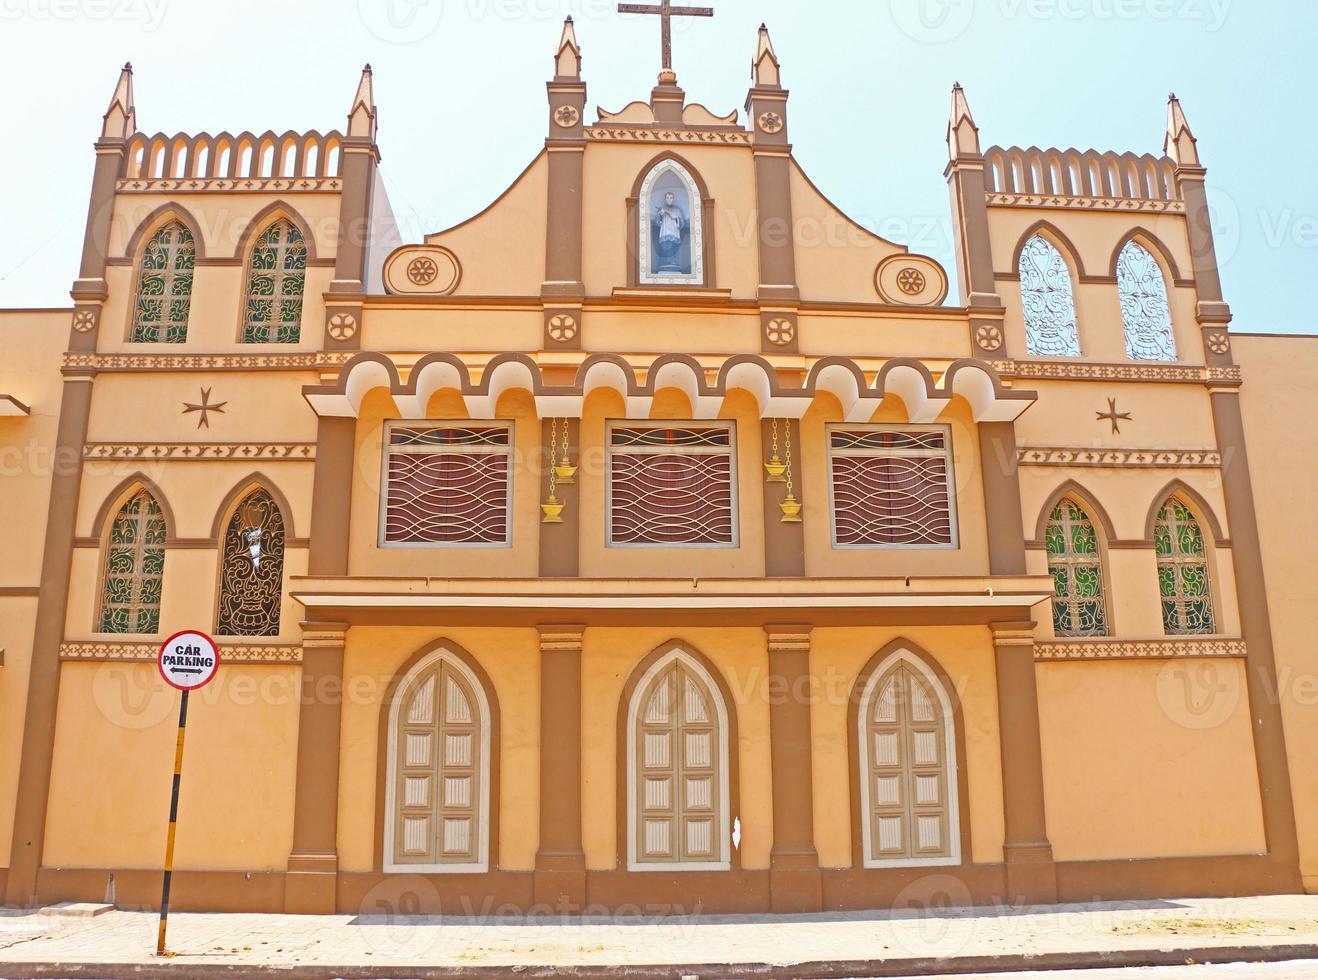 convento e convento ponducherry india foto